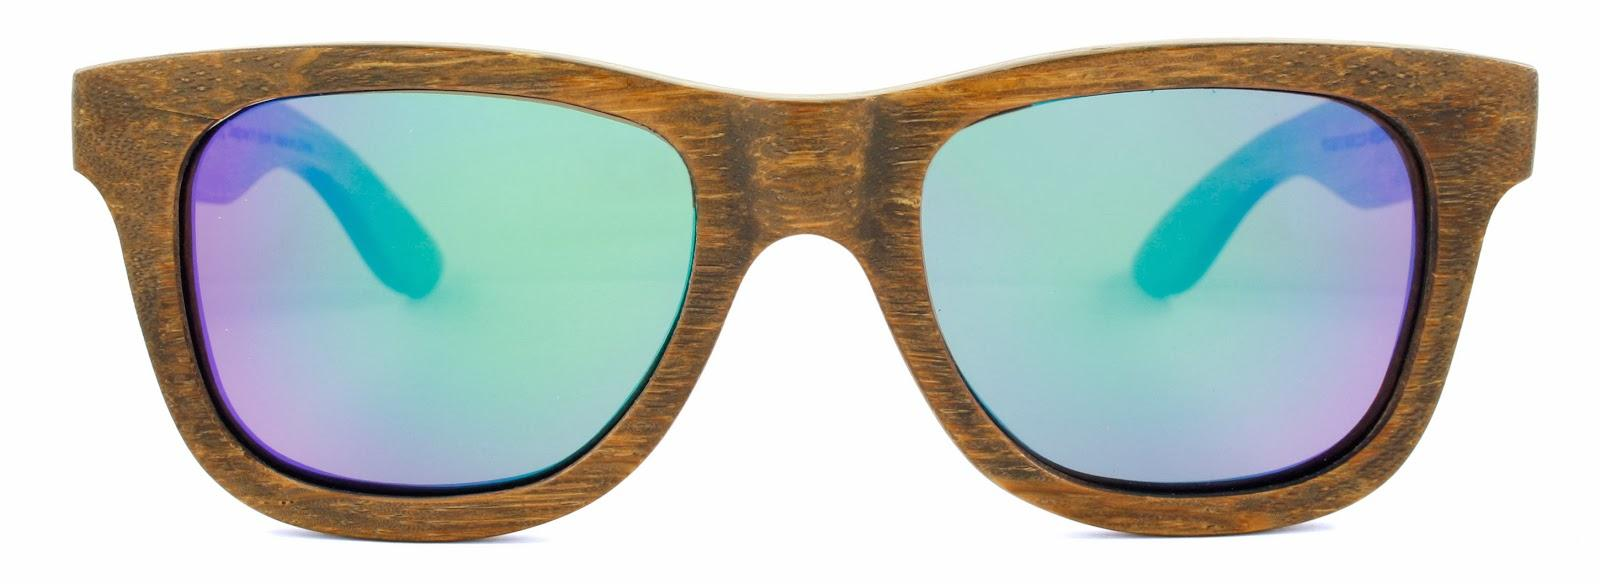 gafas-madera-sol